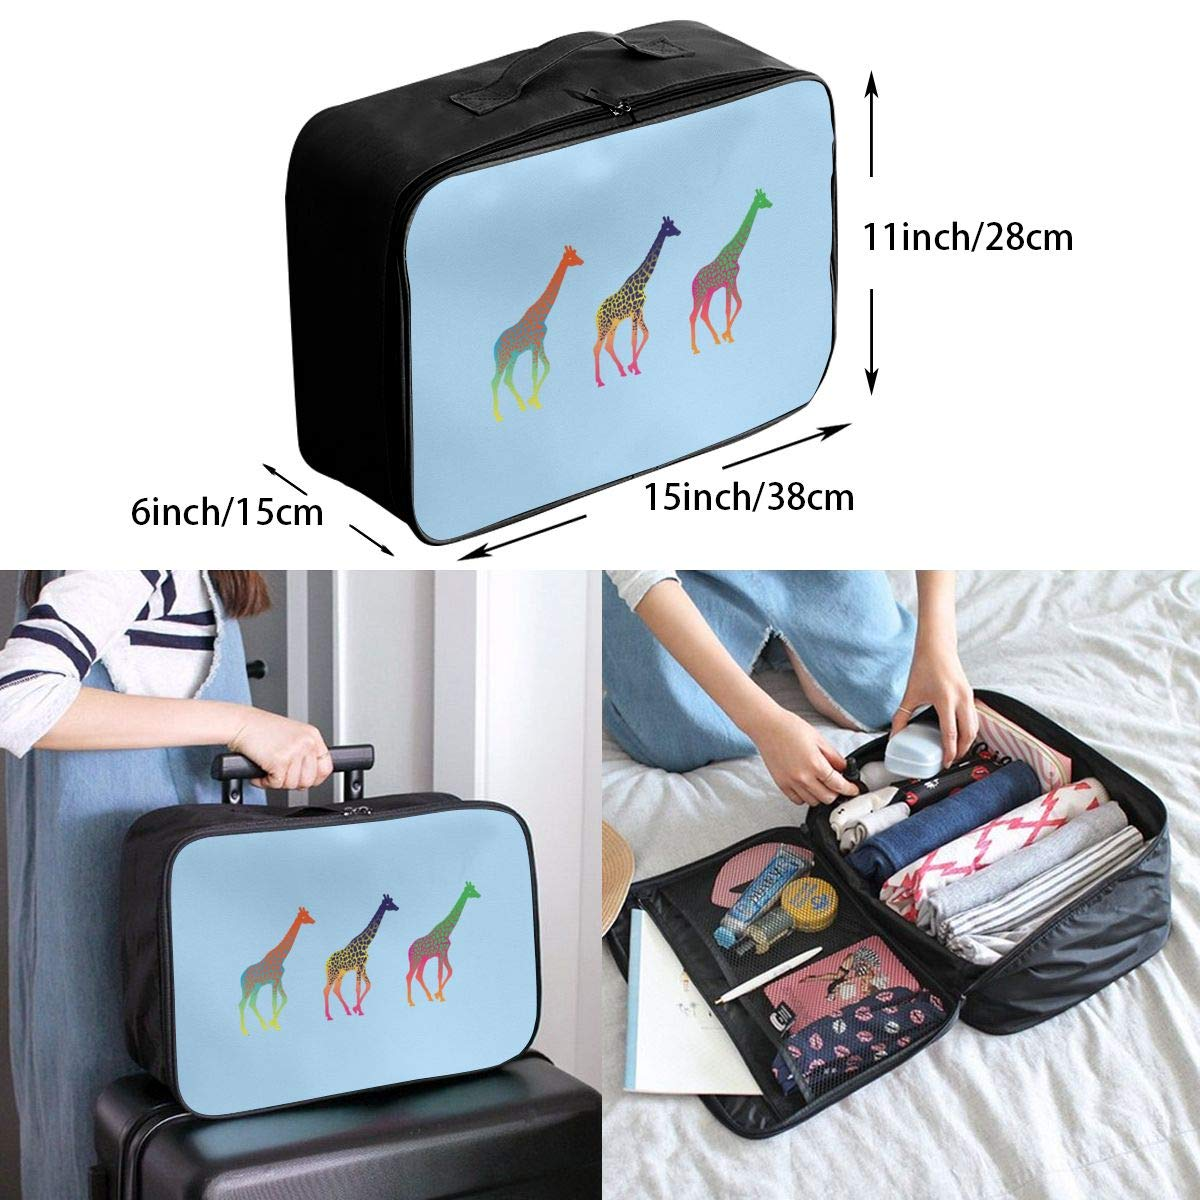 Giraffe Travel Luggage Storage Bag Duffel Bag Handle Makeup Bag Fashion Lightweight Large Capacity Portable Luggage Bag